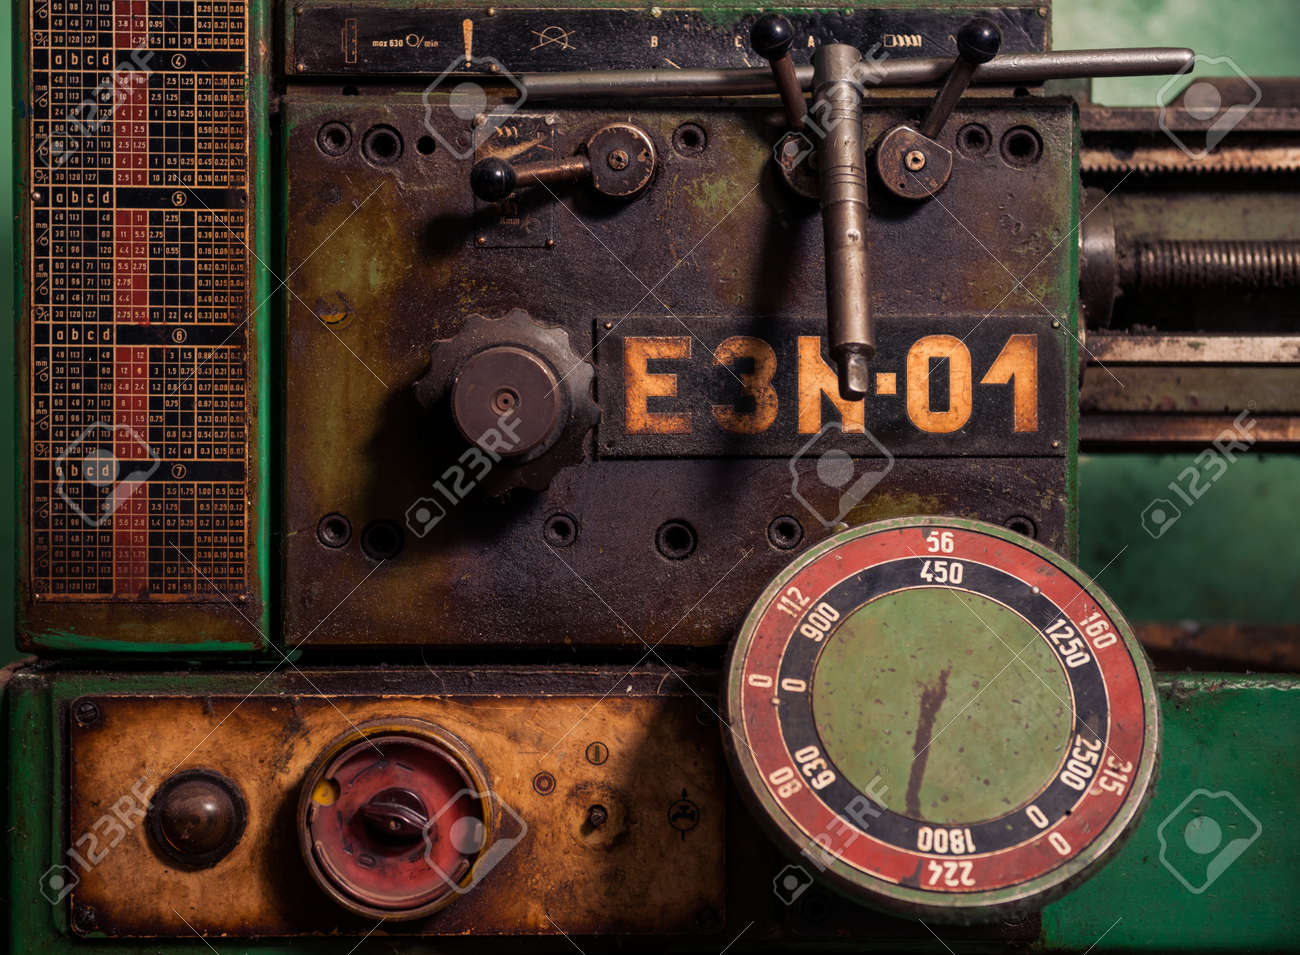 control panel of vintage metal processing machine - 116678509